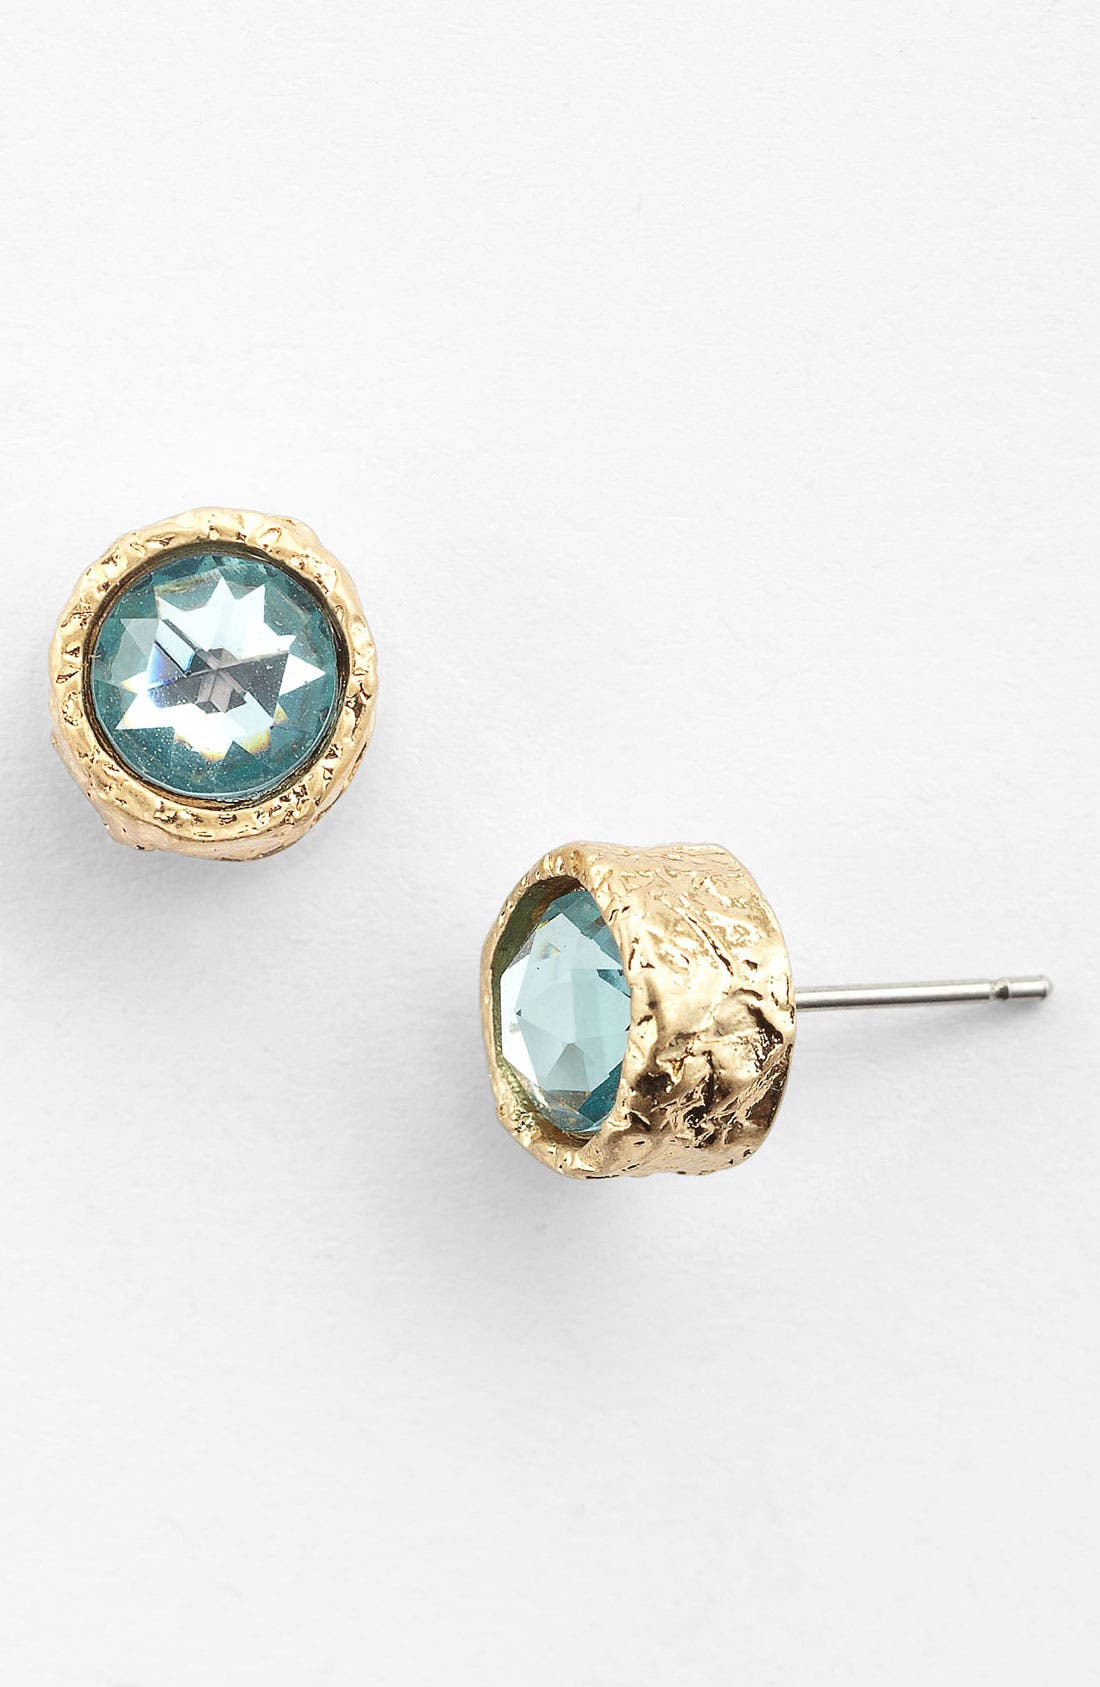 Alternate Image 1 Selected - MARC BY MARC JACOBS 'Paste & Prints' Stud Earrings